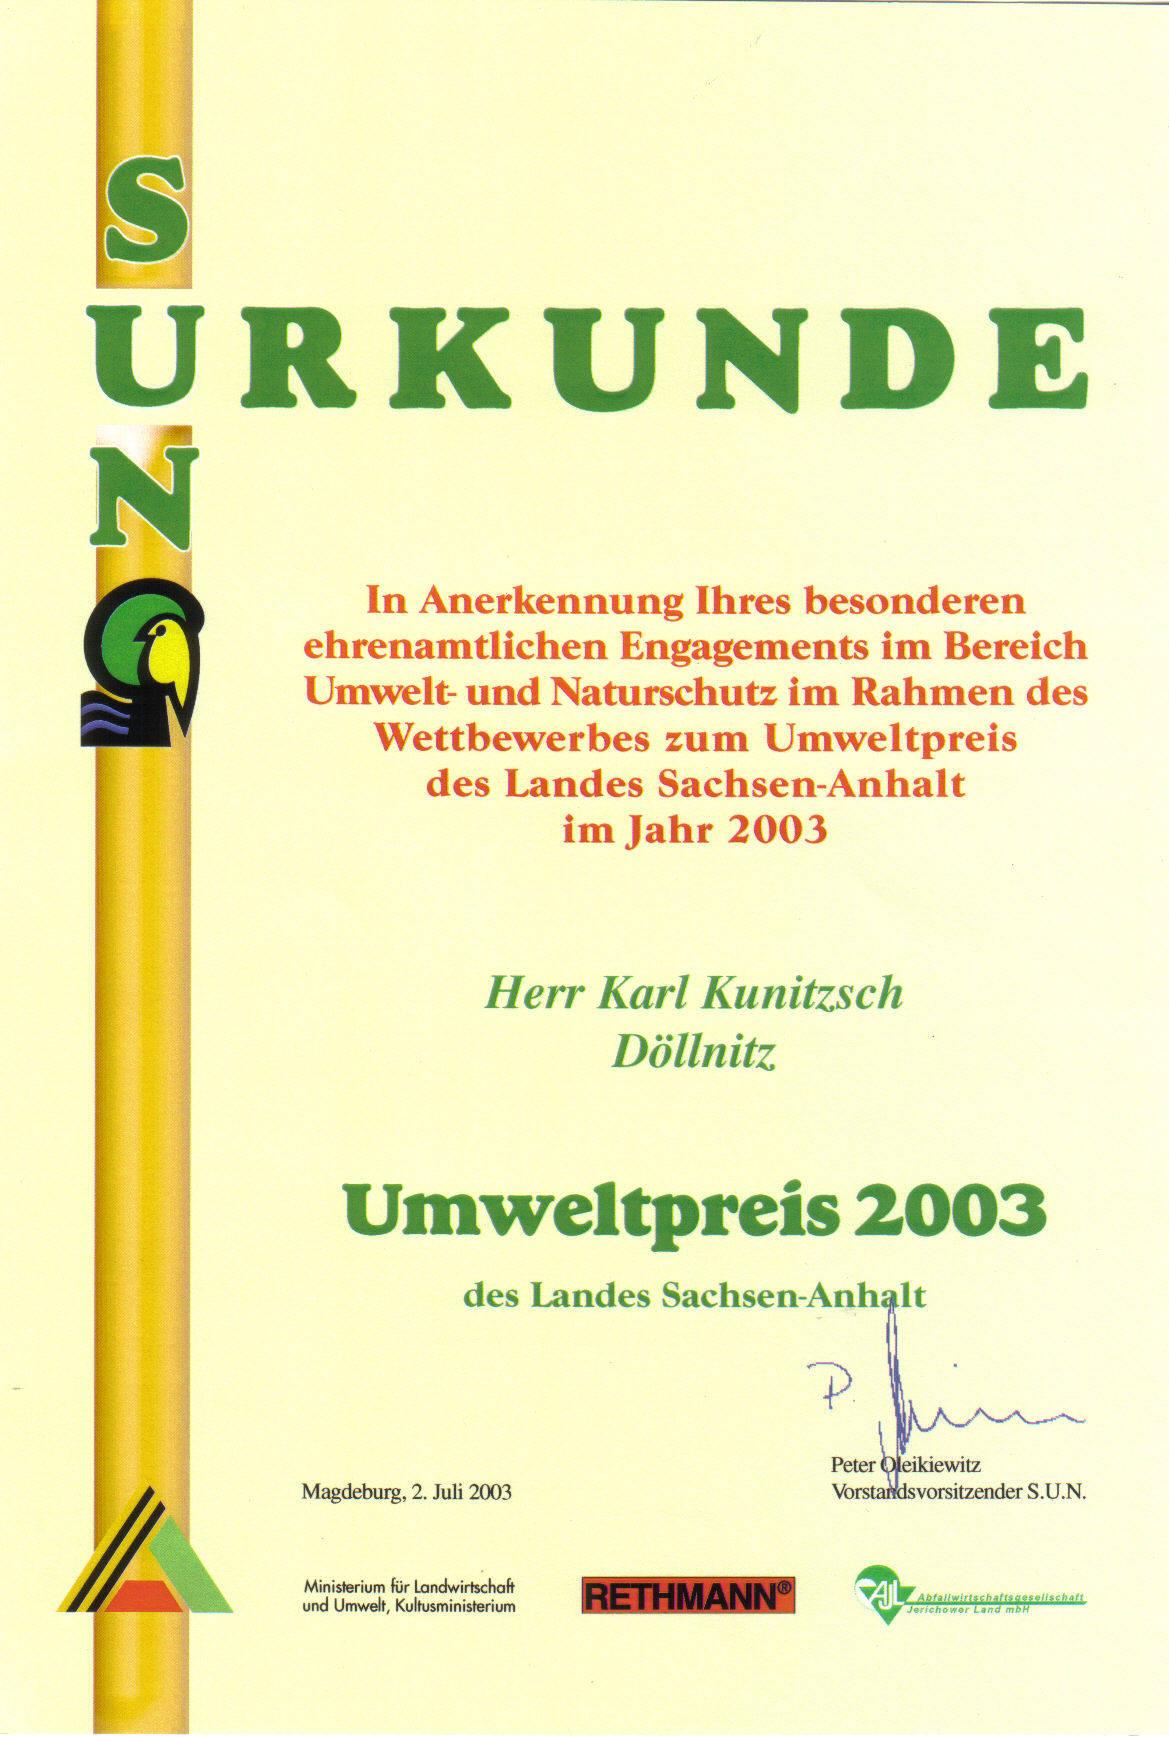 Umweltpreis 2003